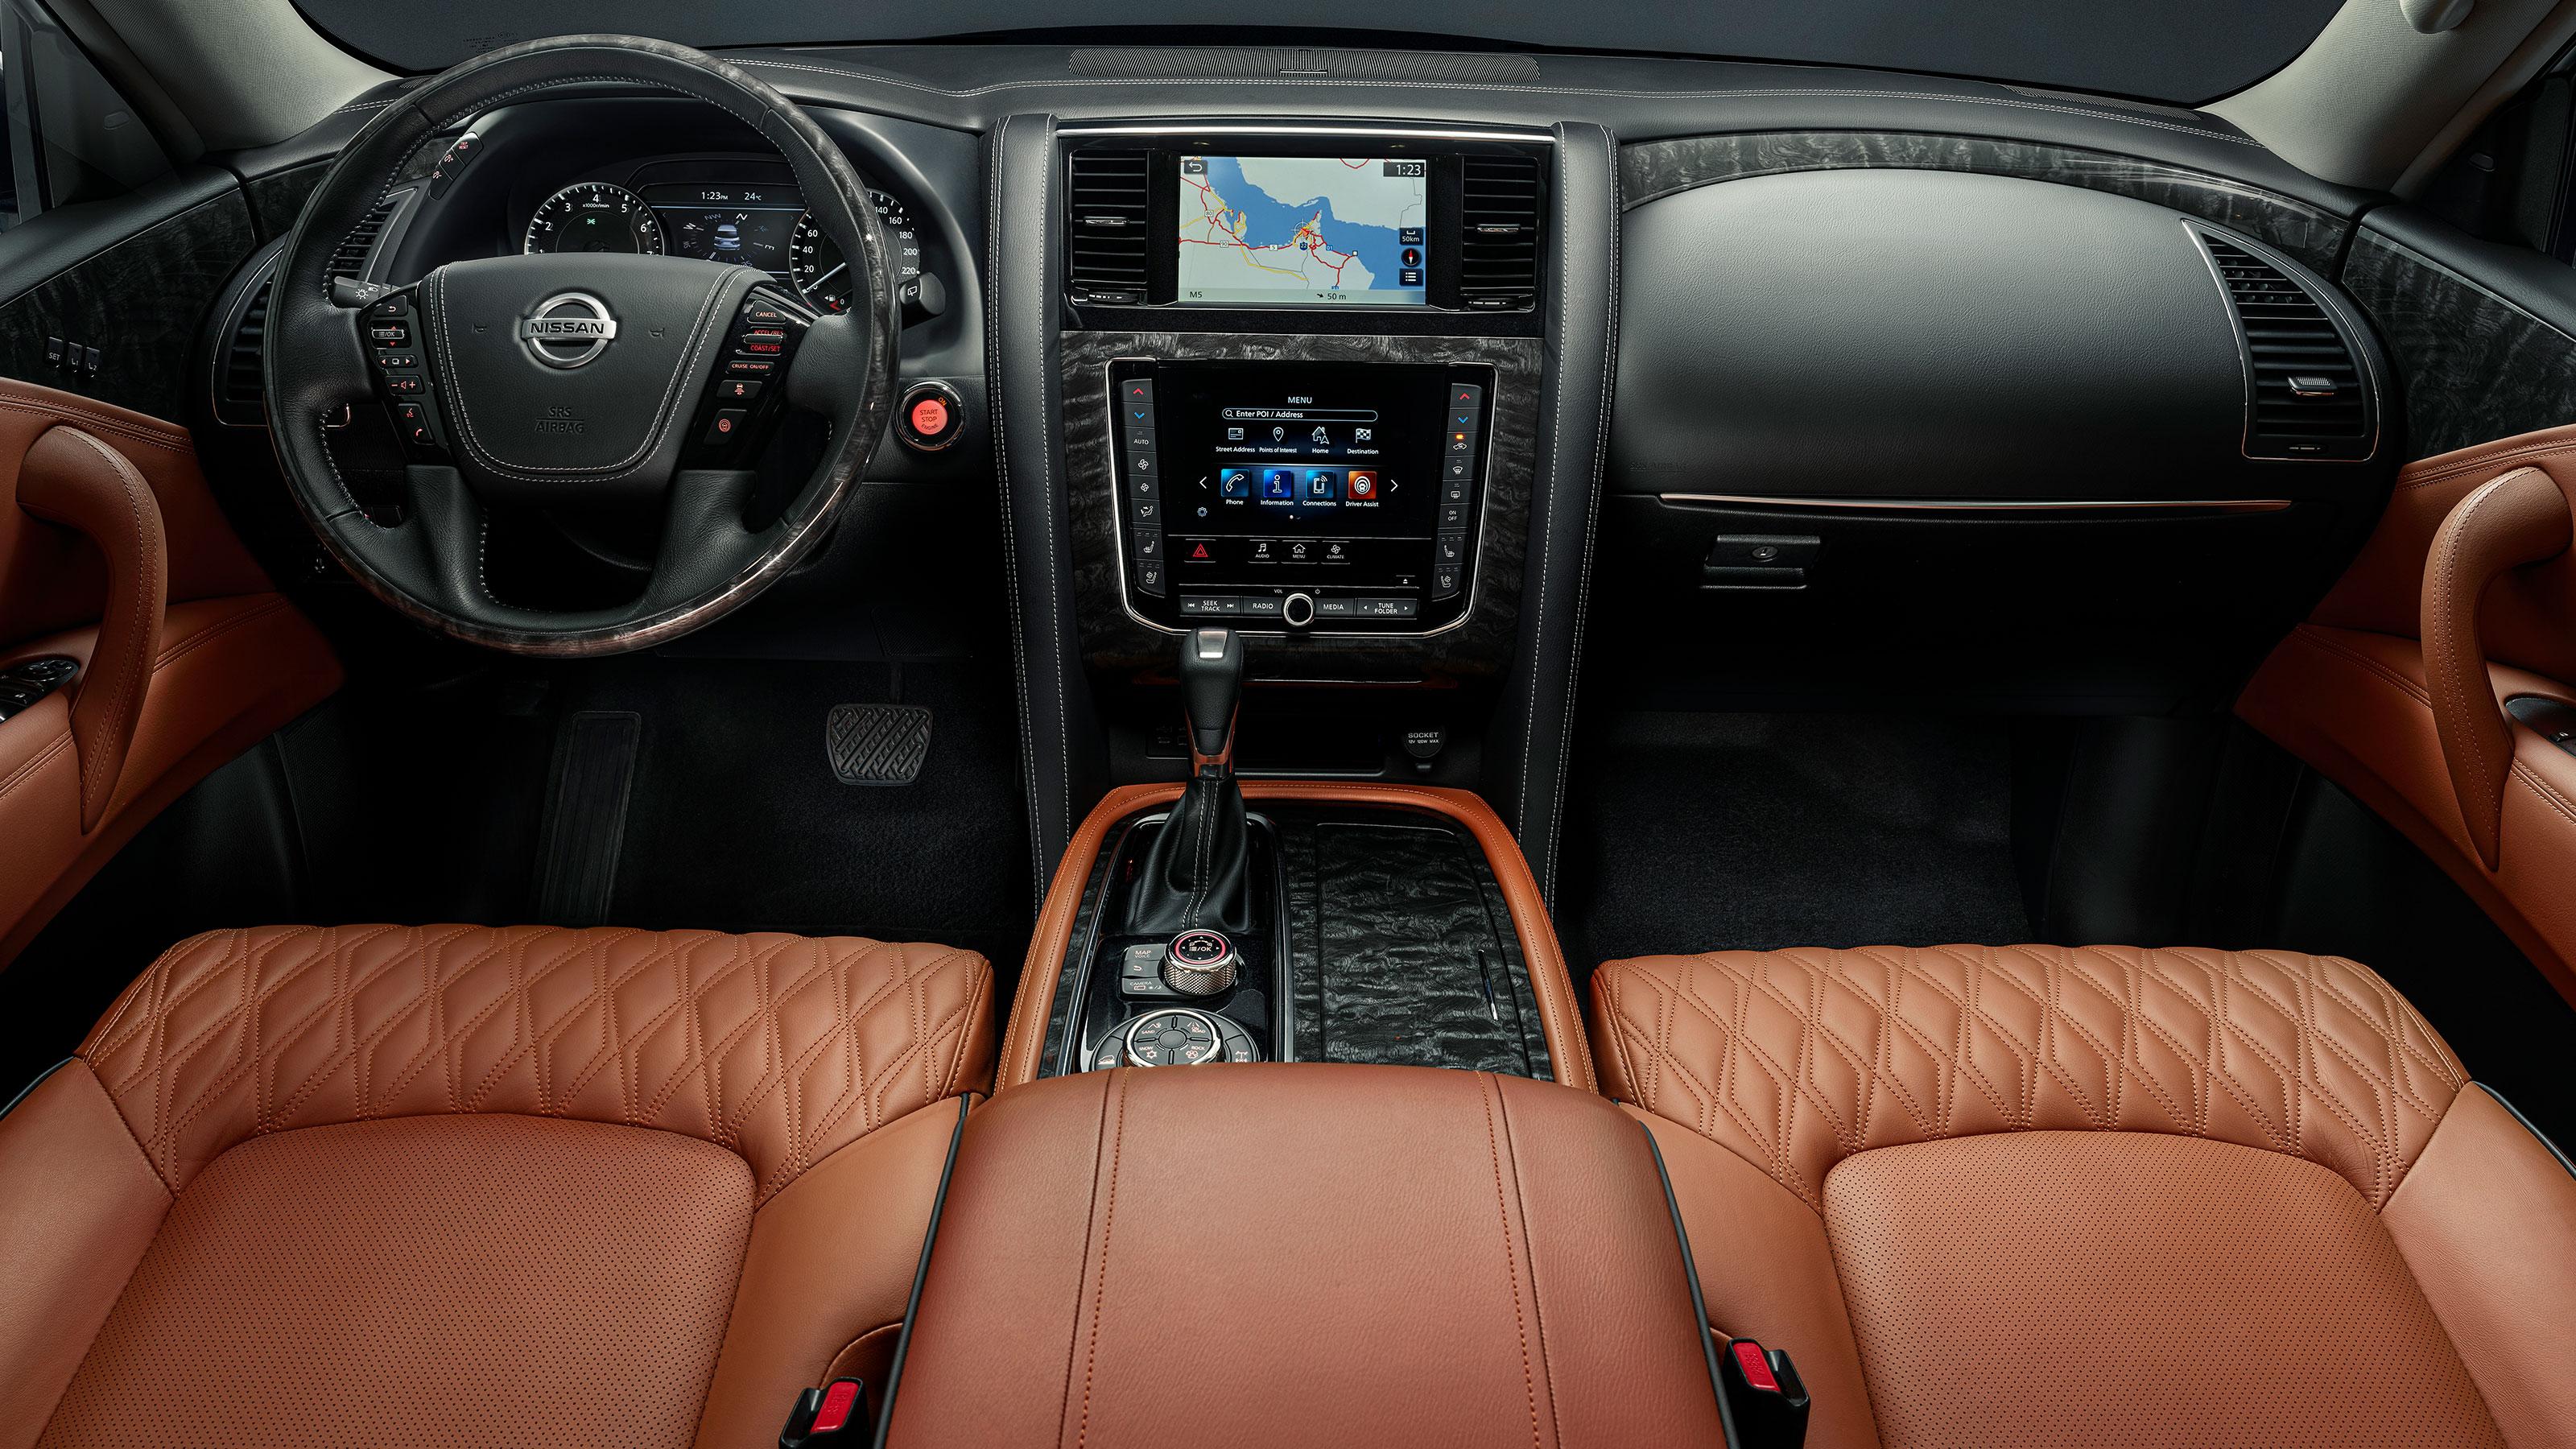 2020 NISSAN PATROL interior cockpit and screens